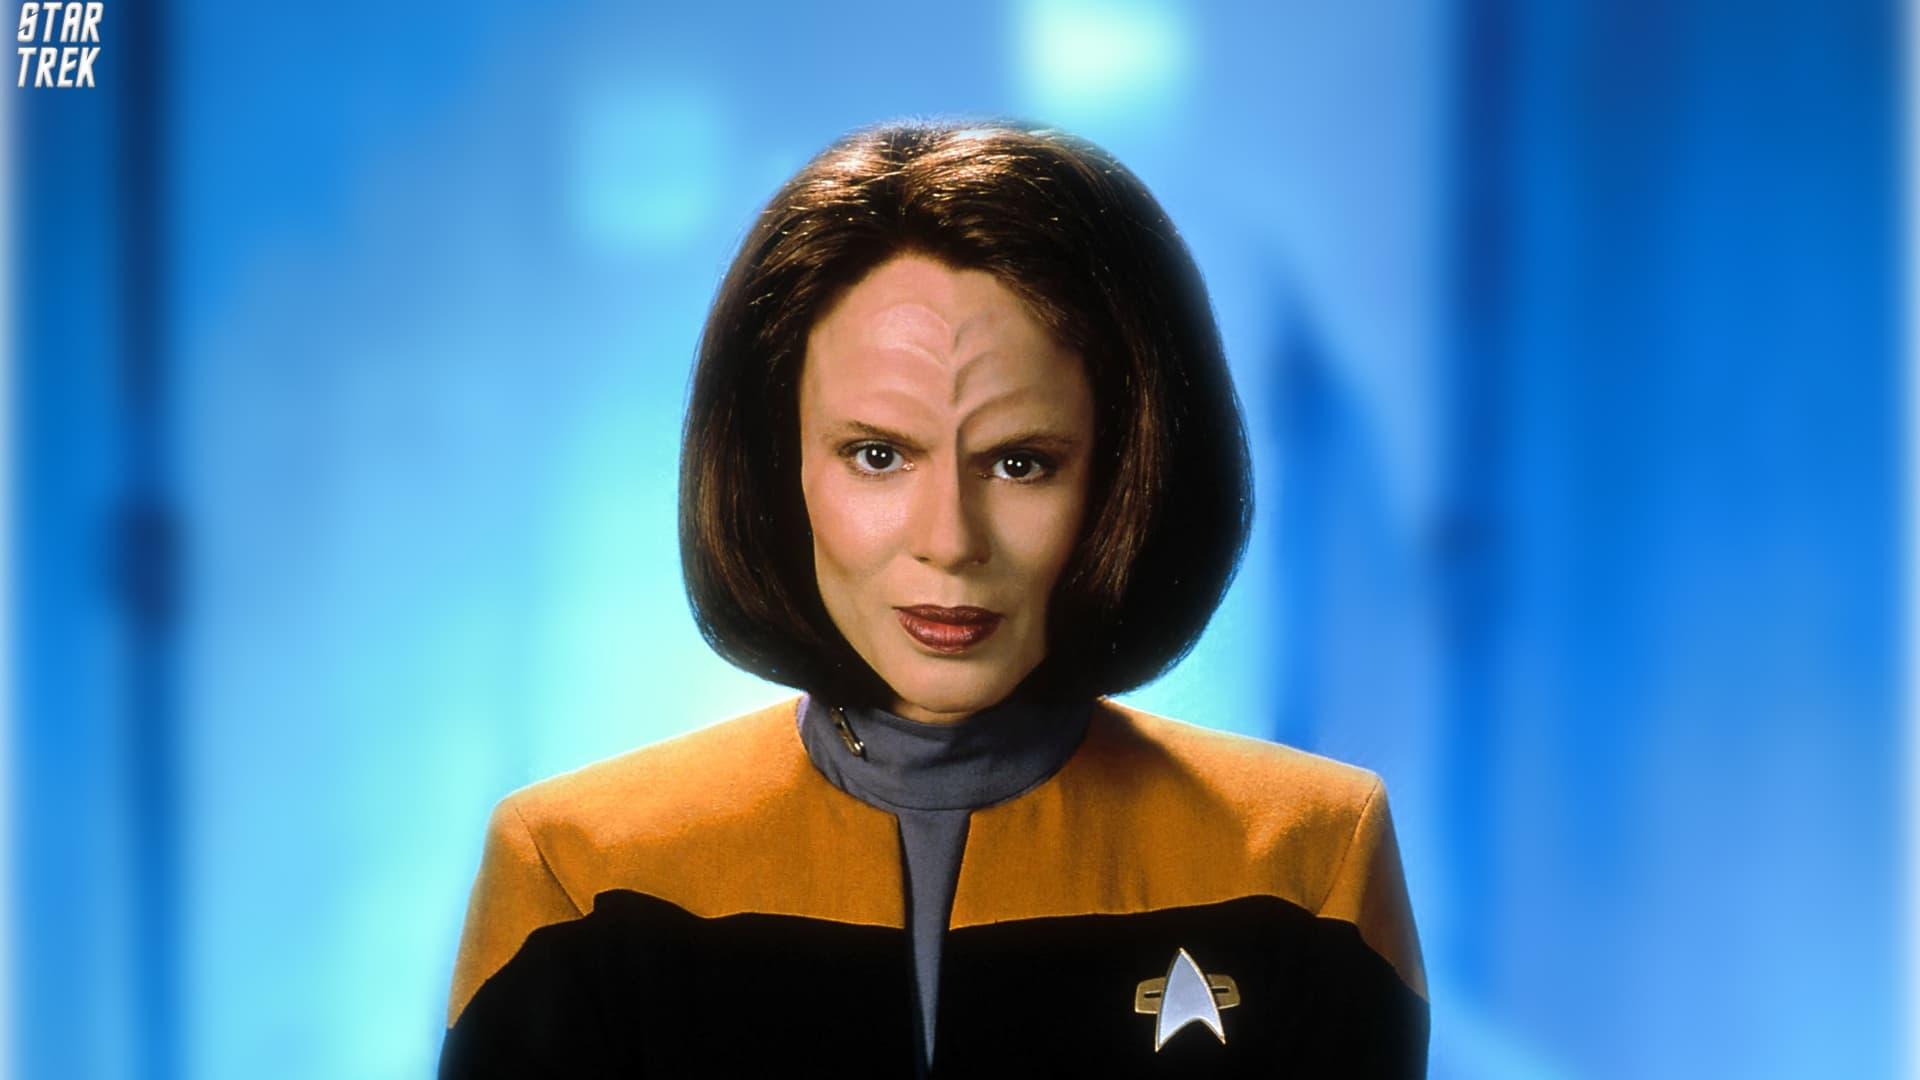 Star Trek: Voyager - Specials (1970)